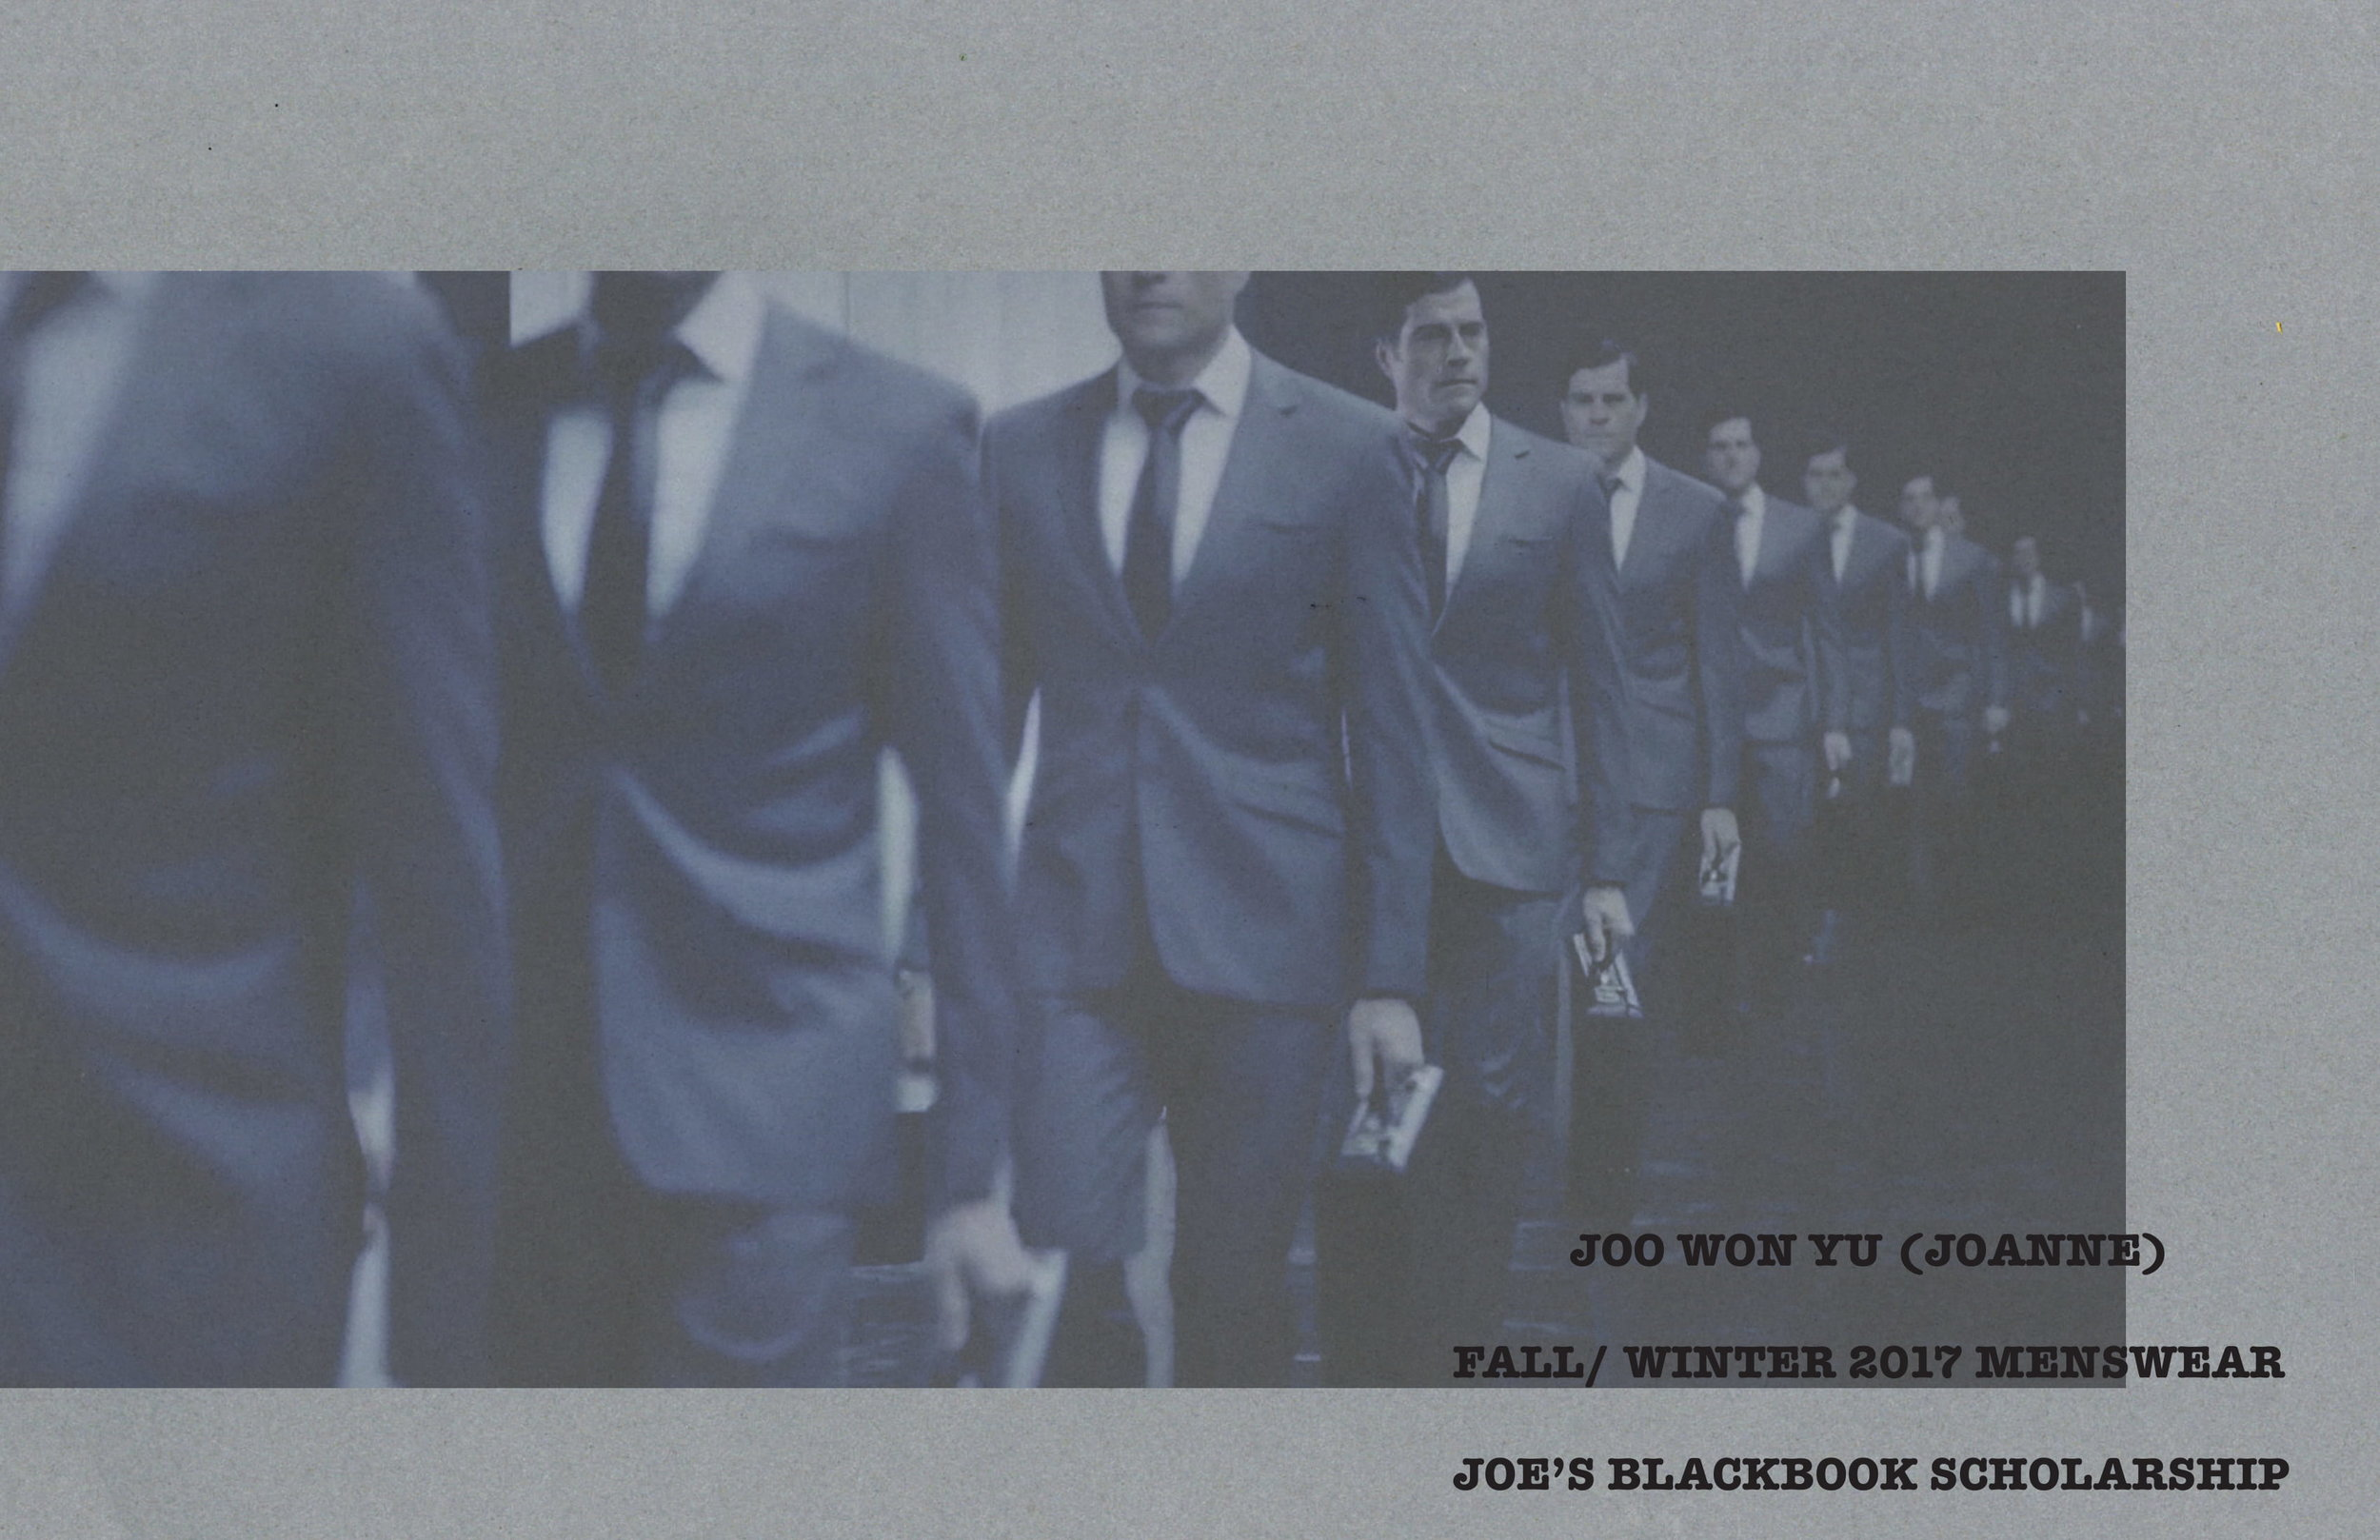 JOOWON YU-JOE'S BLACK BOOK-ilovepdf-compressed-01.jpg